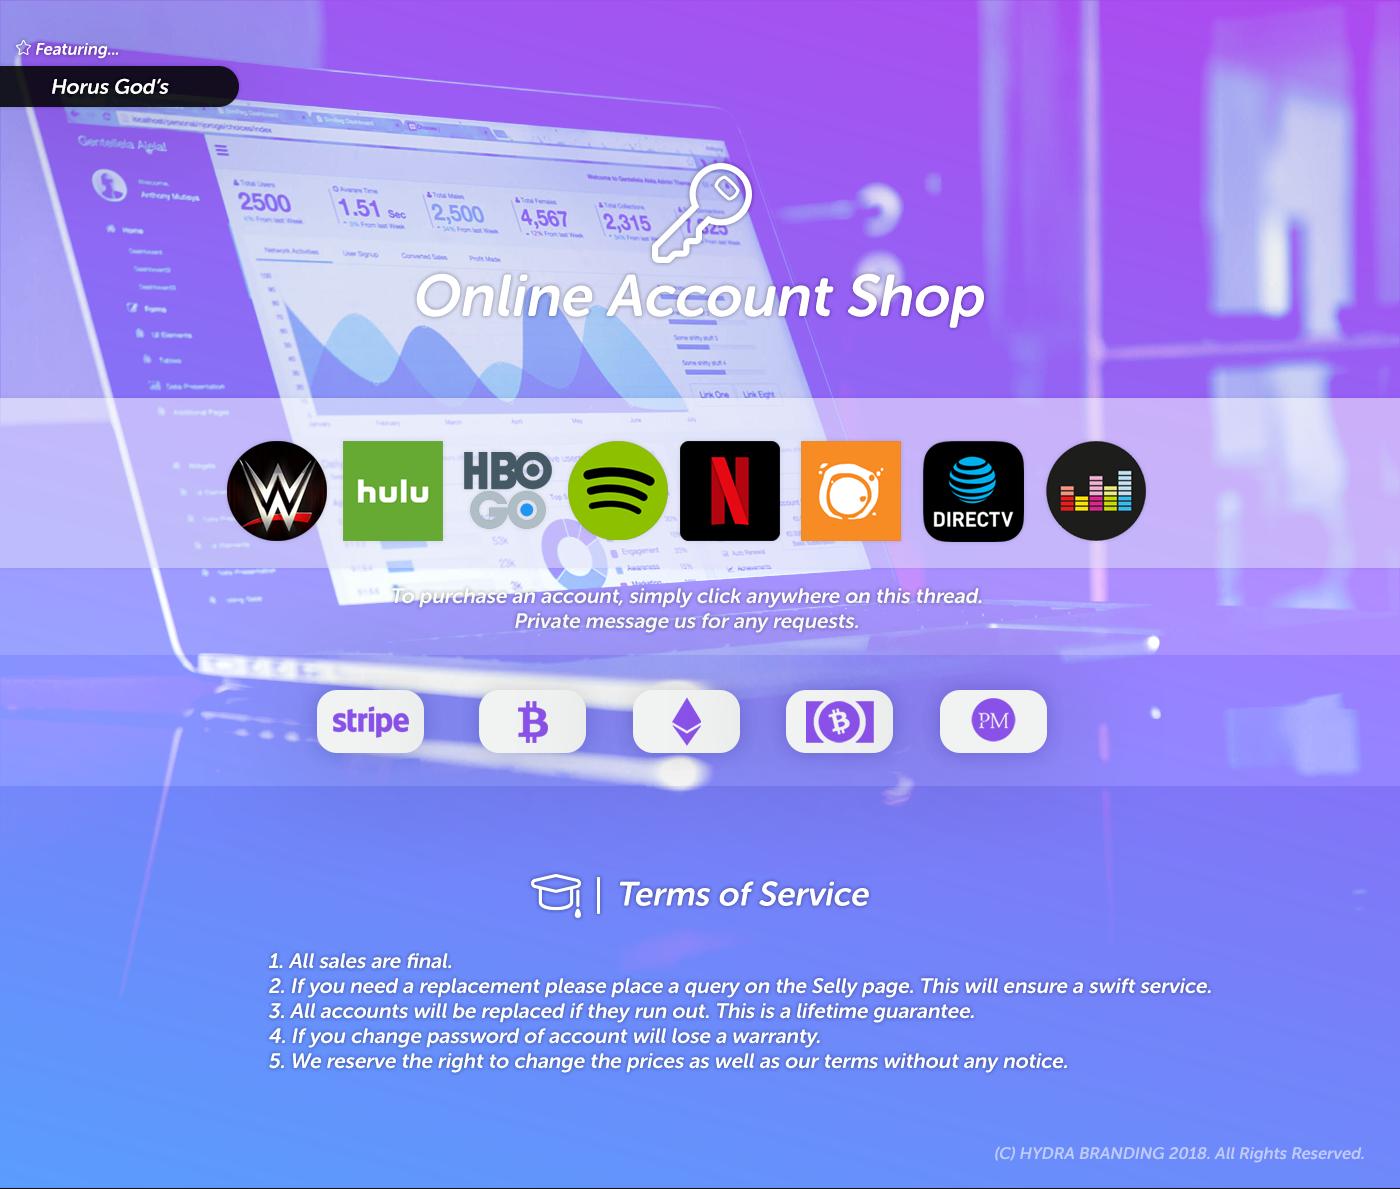 HorusGod's Shop - [$1 00] Crunchyroll,Netflix,Spotify,Hulu